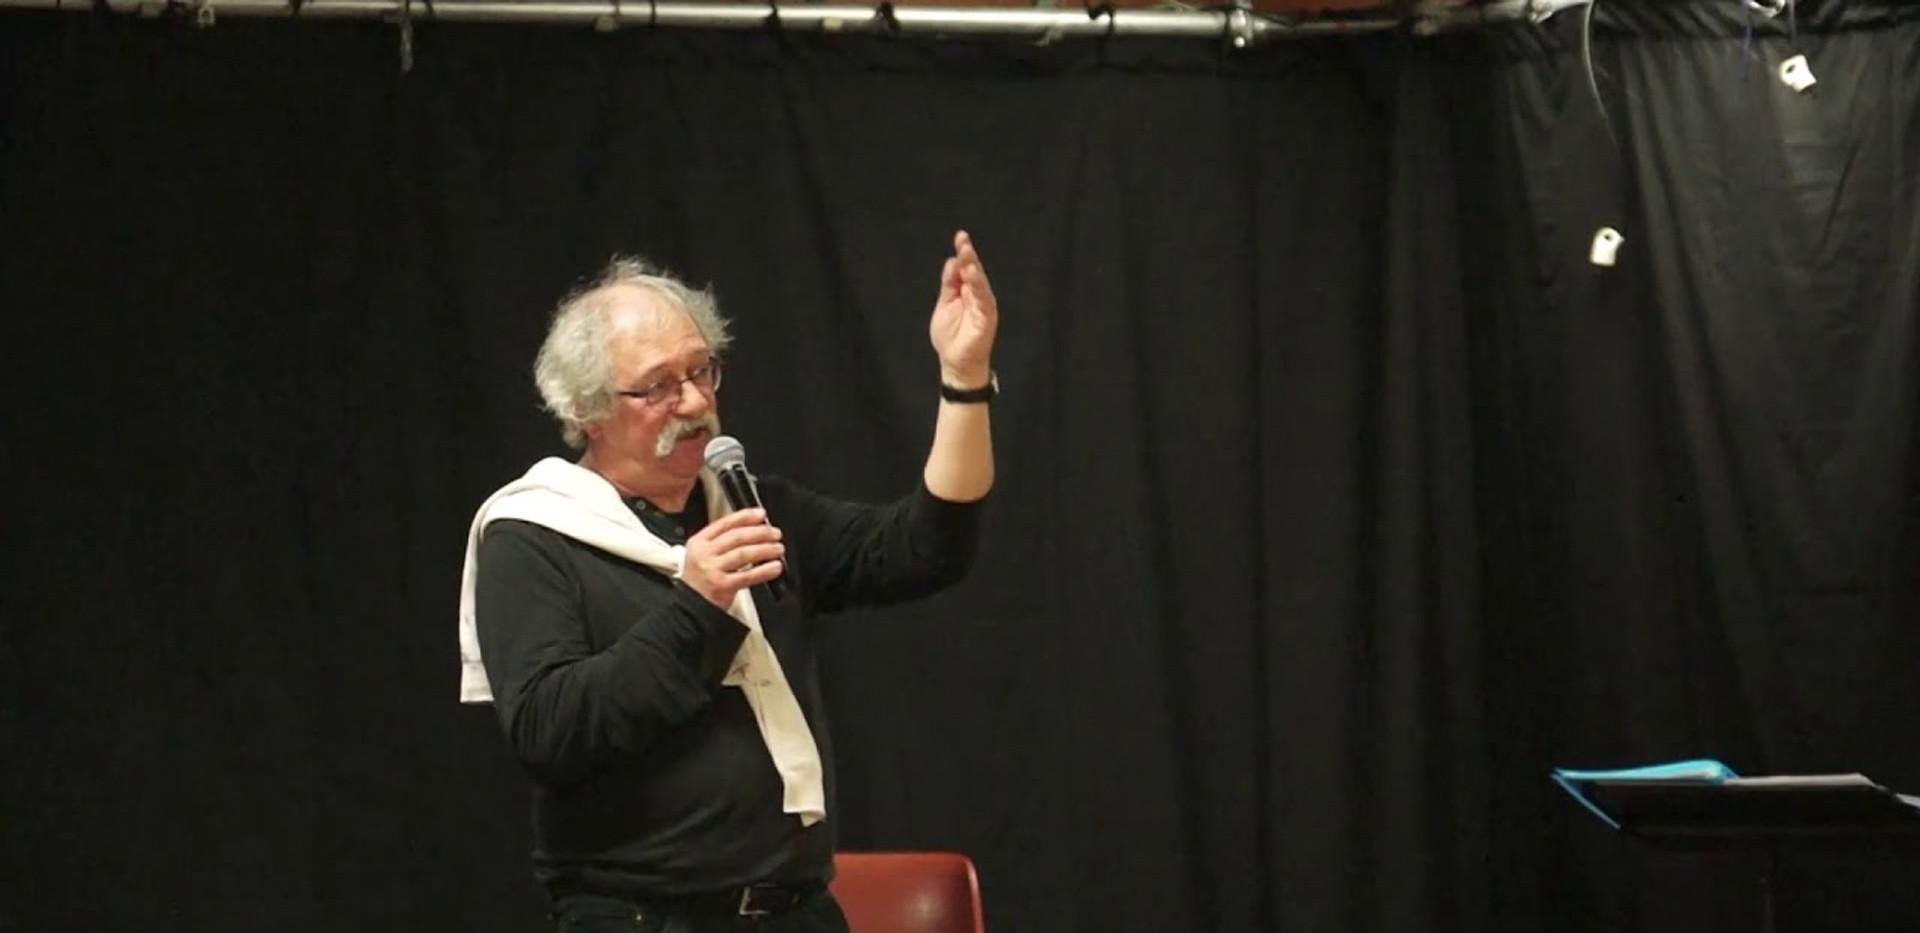 Jean-Claude Botton conteur